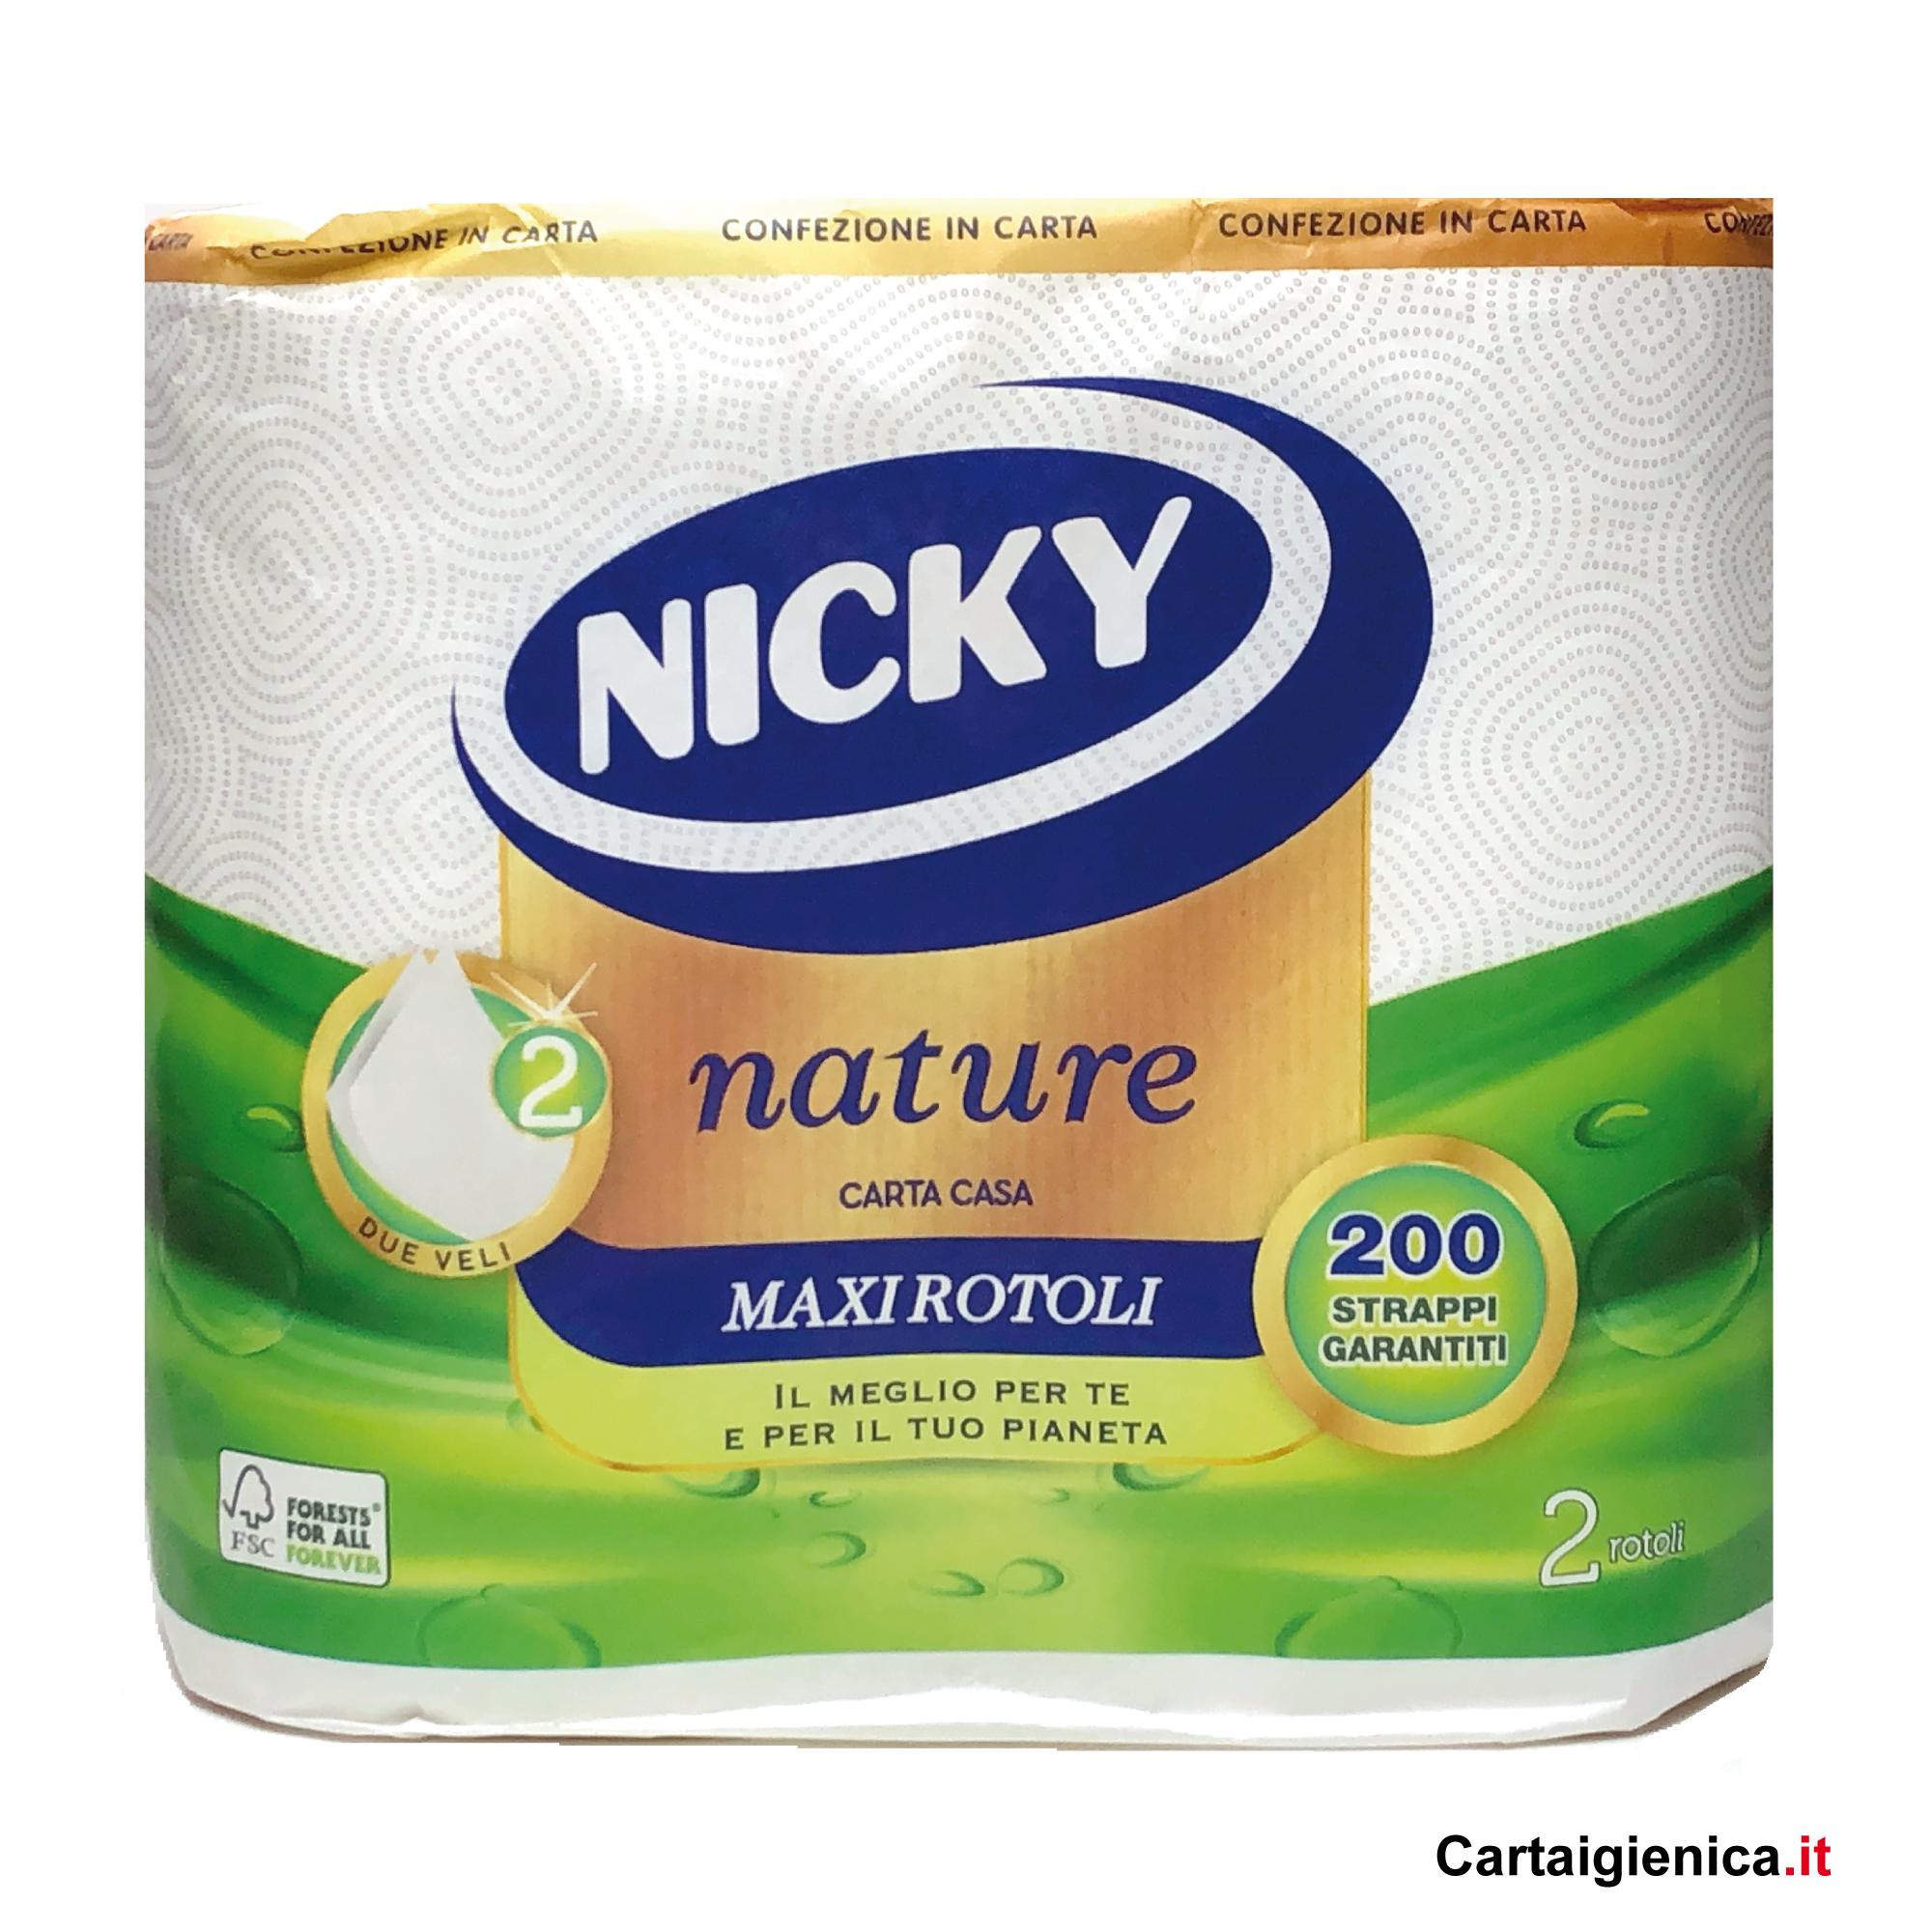 nicky carta cucina nature carta casa 2 rotoli asciugatutto